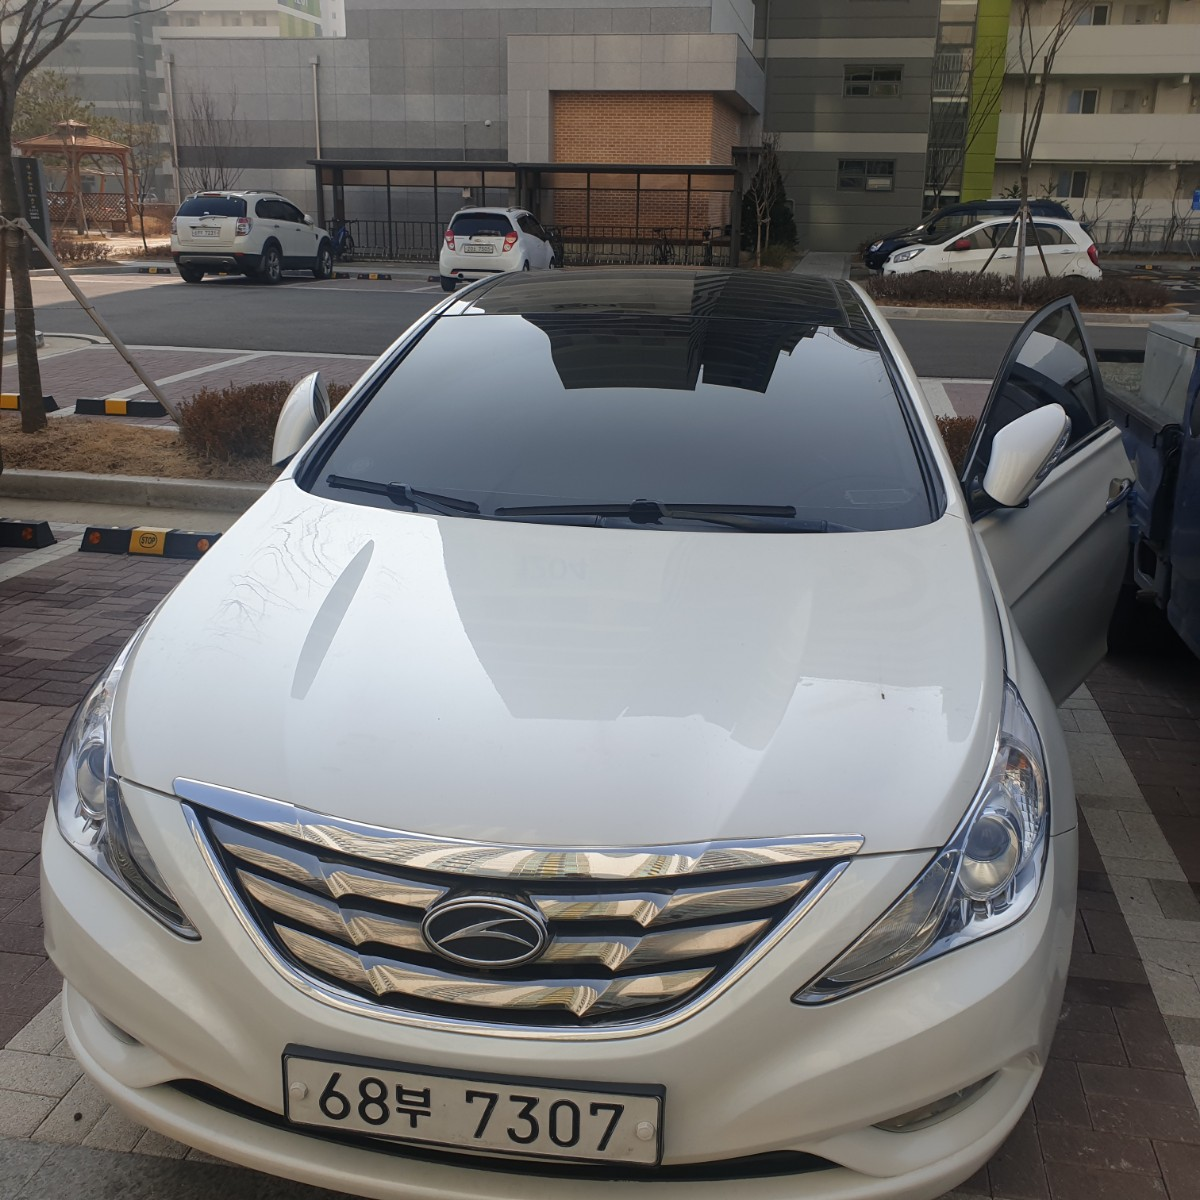 yf자동차 - 1